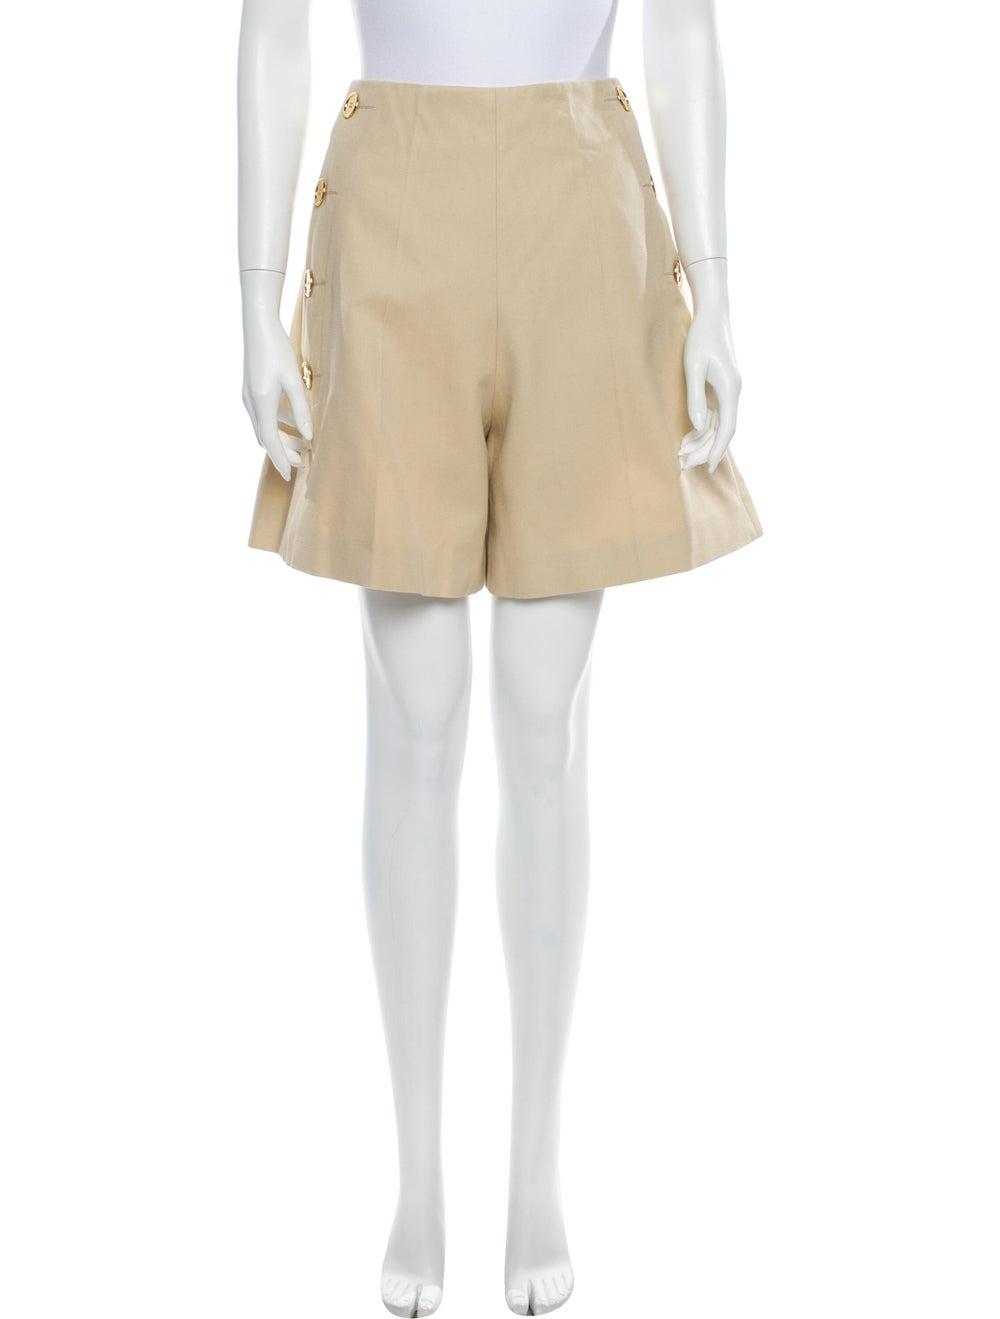 Patou Knee-Length Shorts w/ Tags - image 1